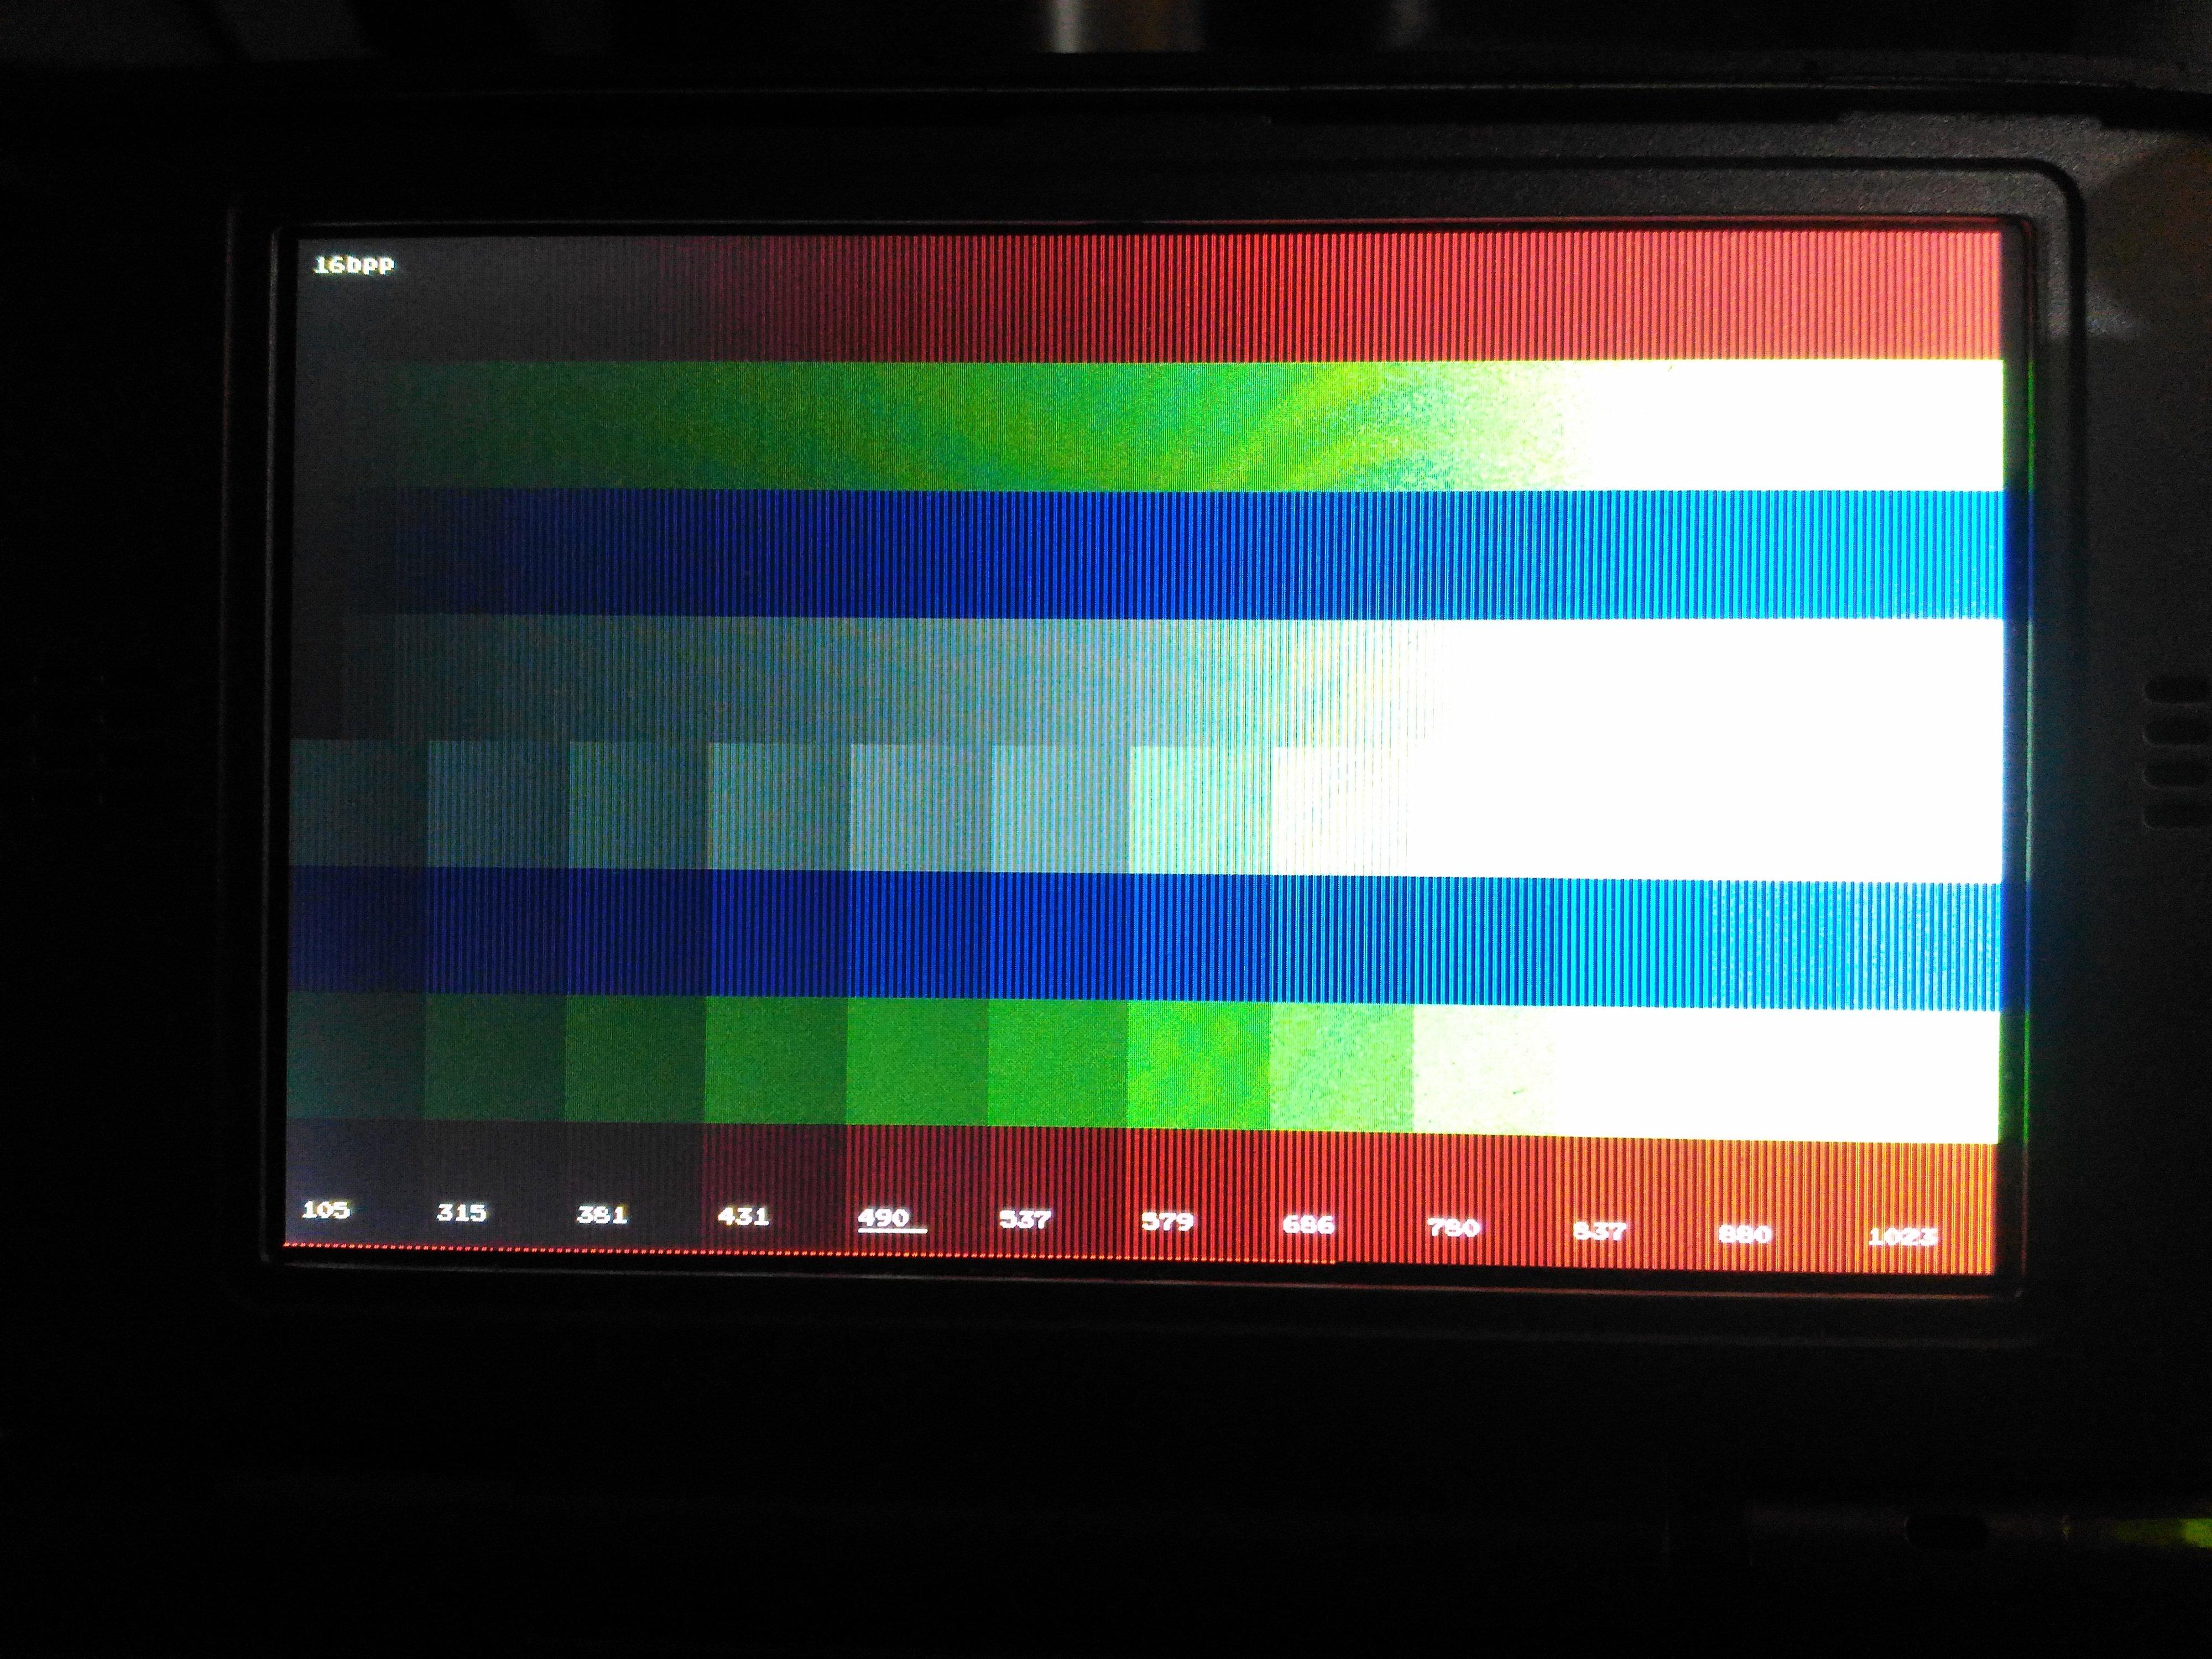 pandora vertical lines.jpg